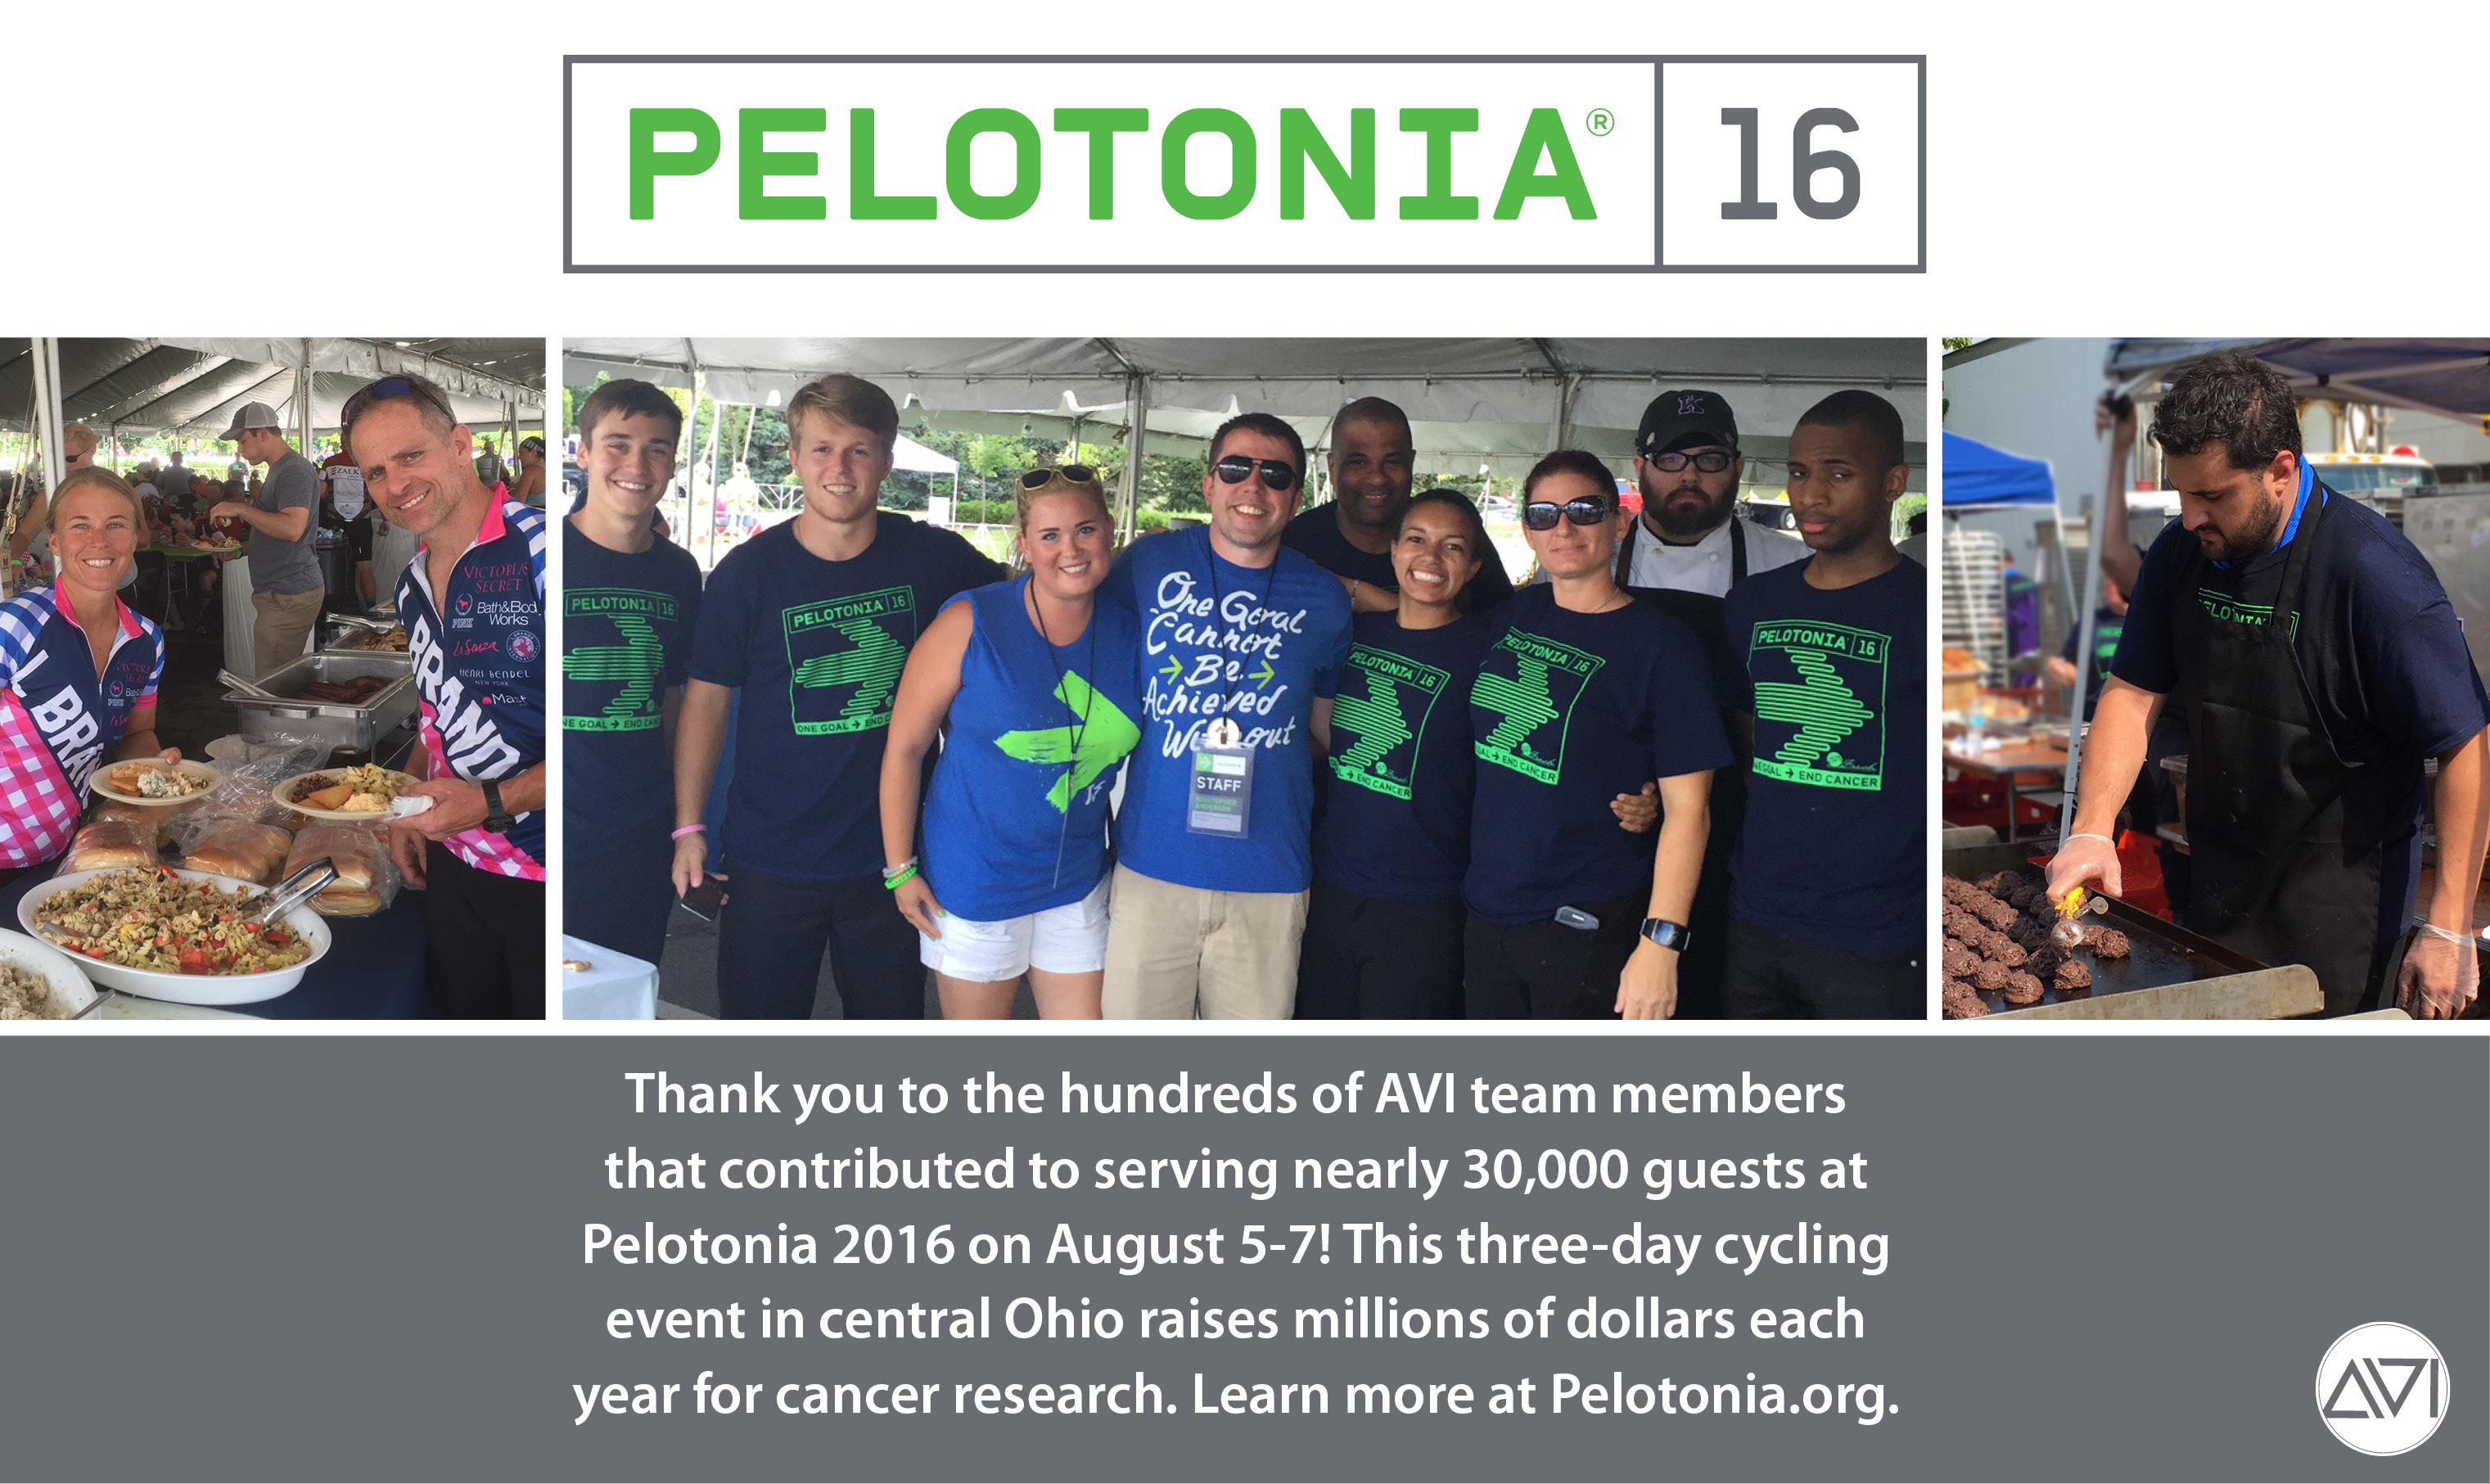 AVI Foodsystems Pelotonia Thank You To Team Members